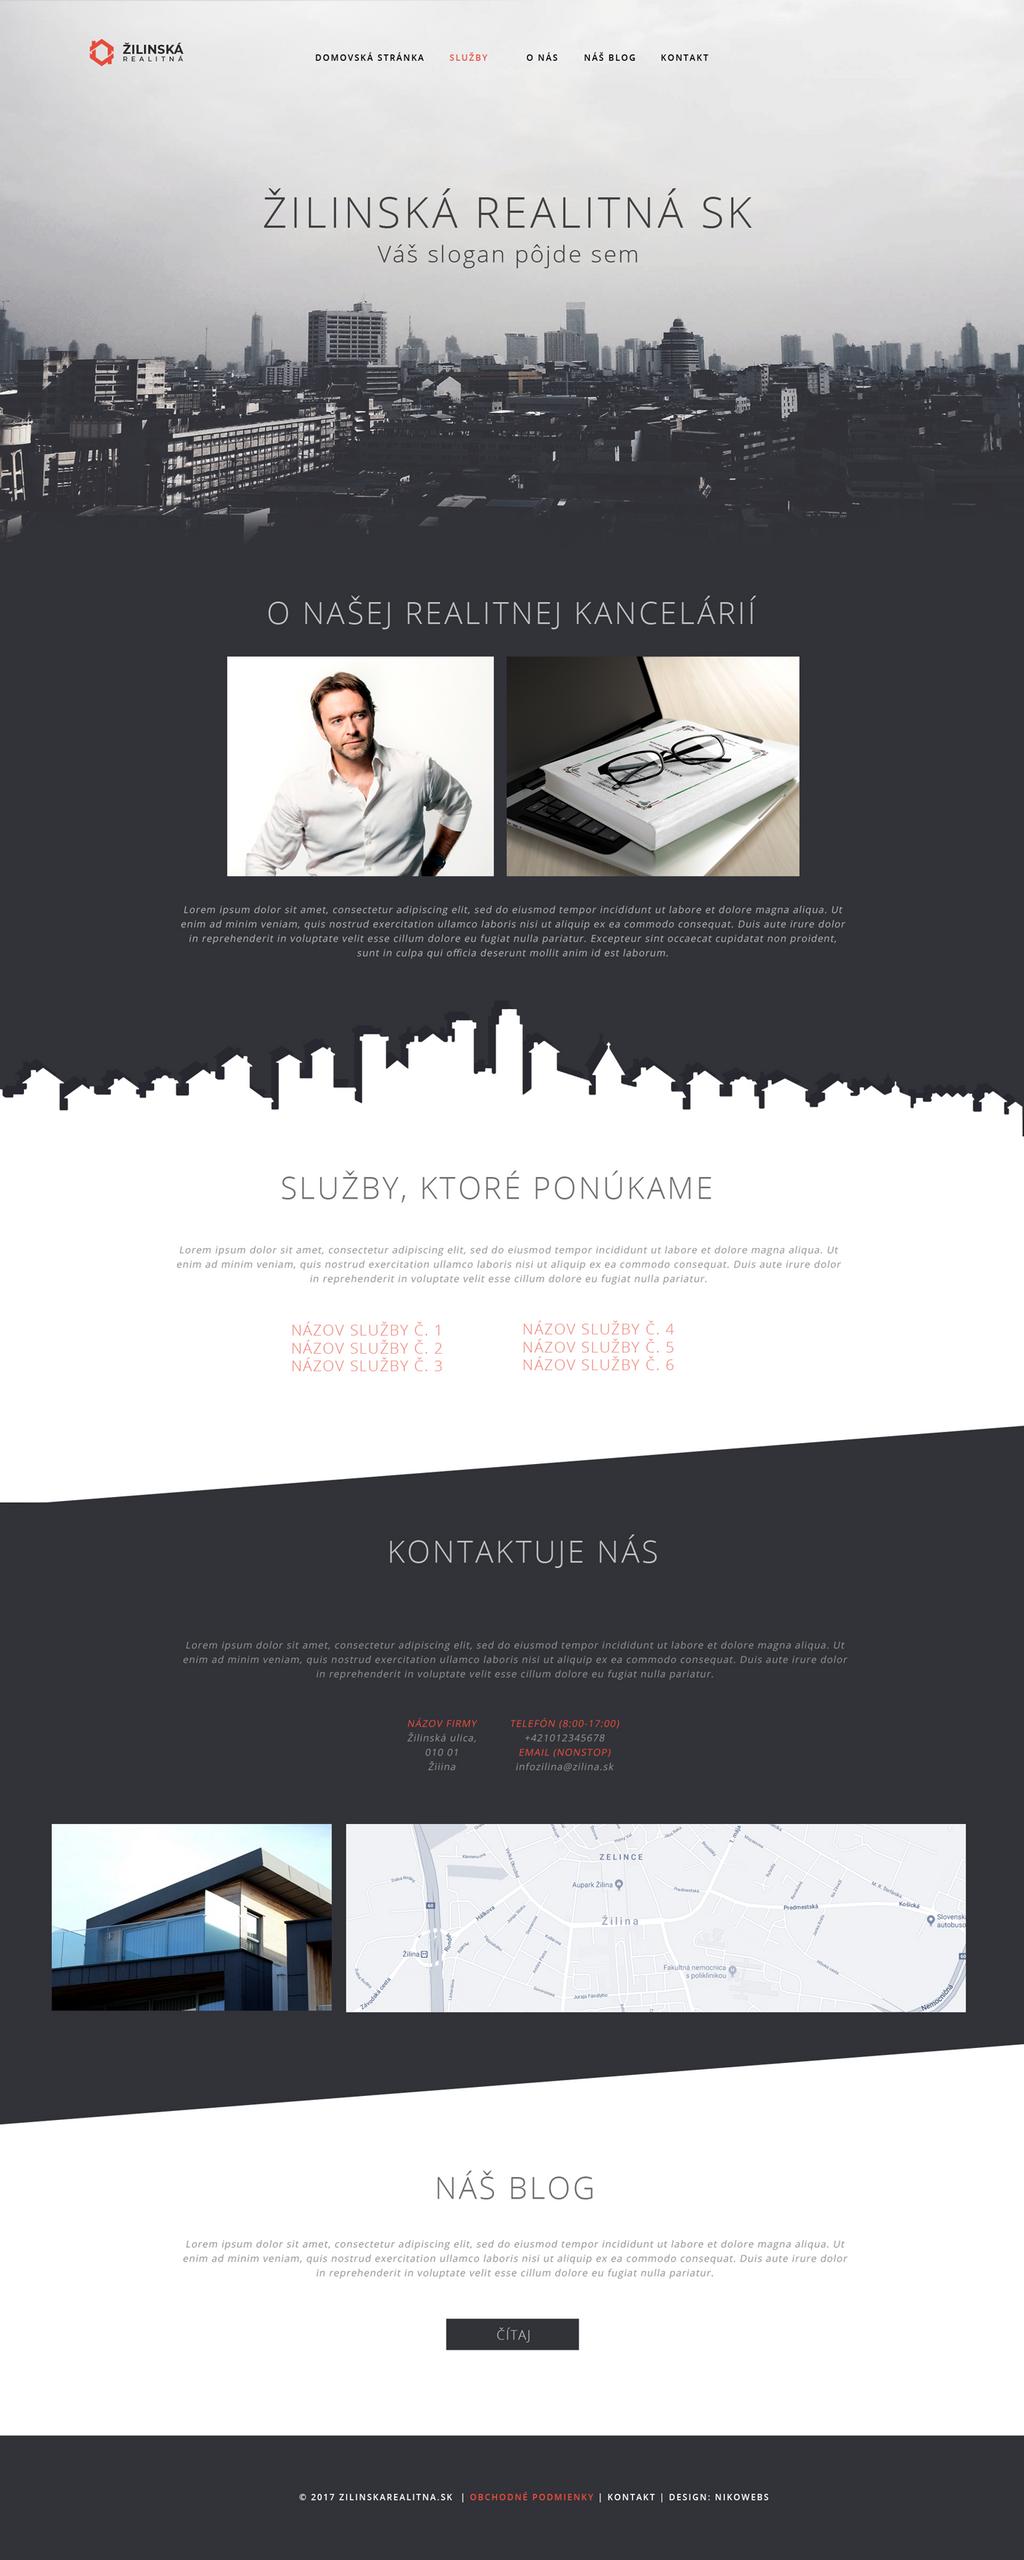 zilinskarealitna.sk | Webdesign by lenkamason